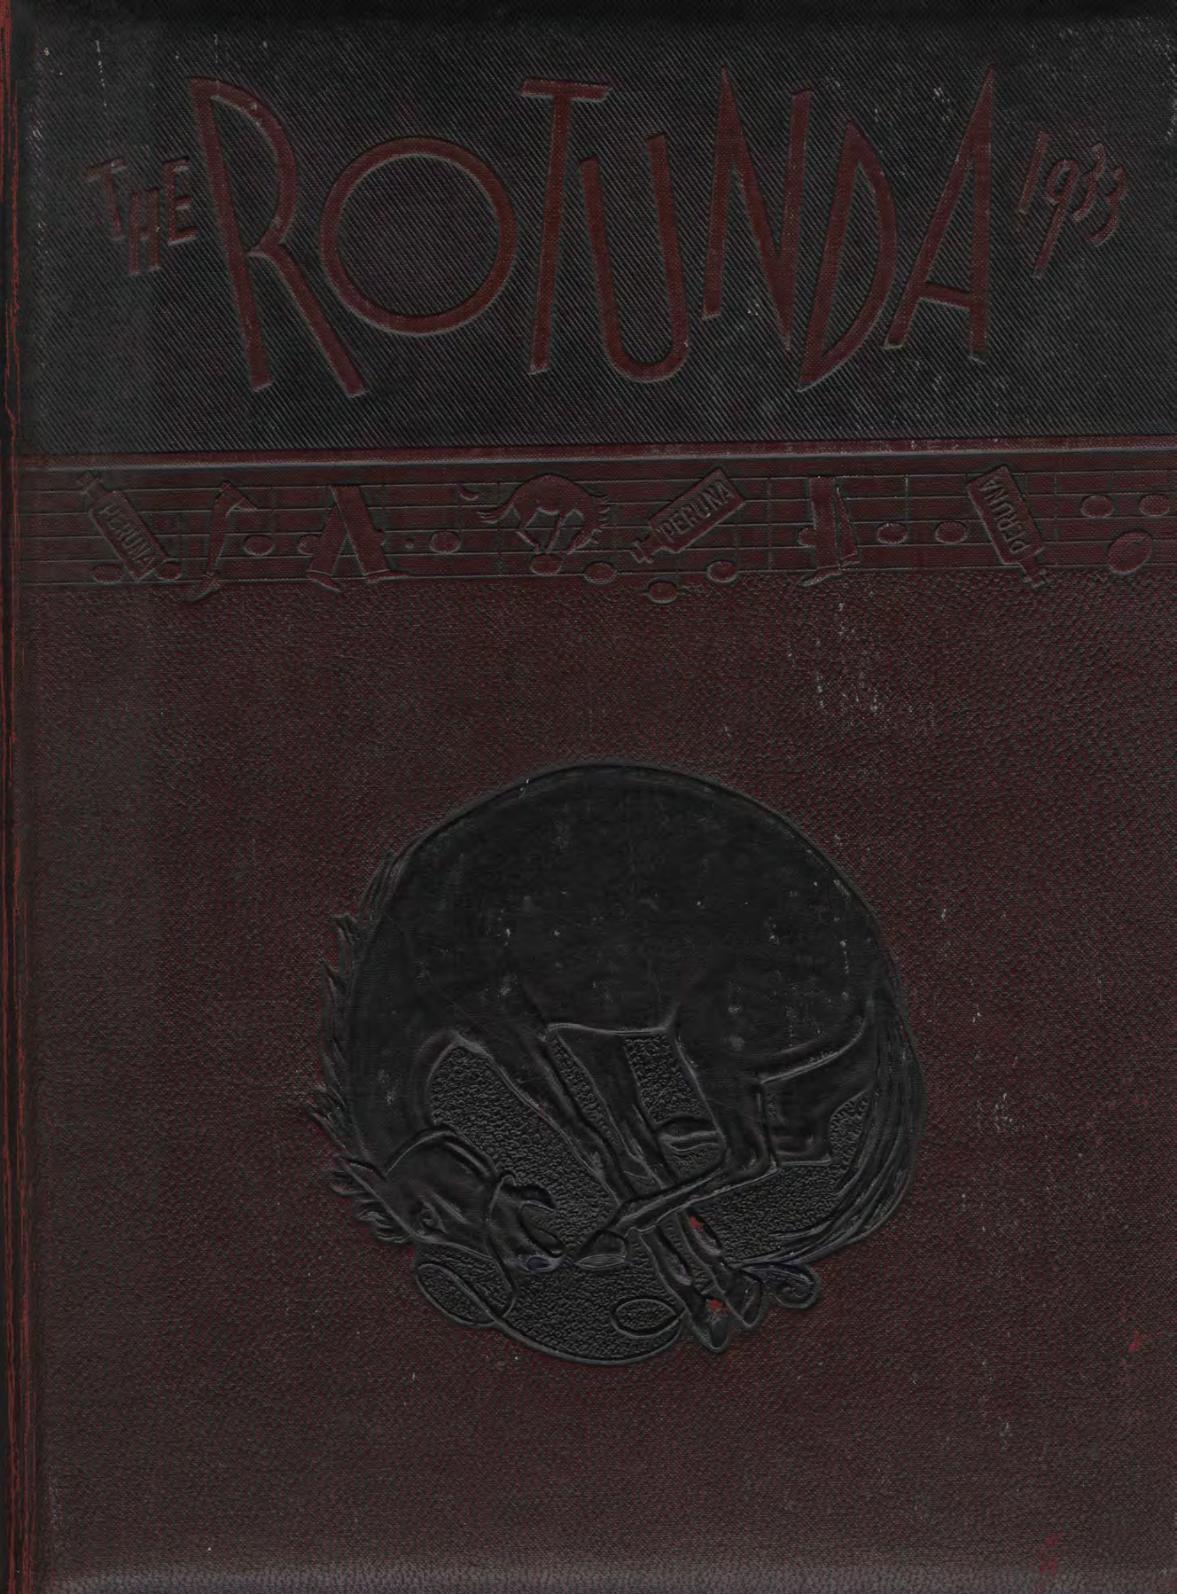 e9c90c855 Calaméo - Rotunda 1933